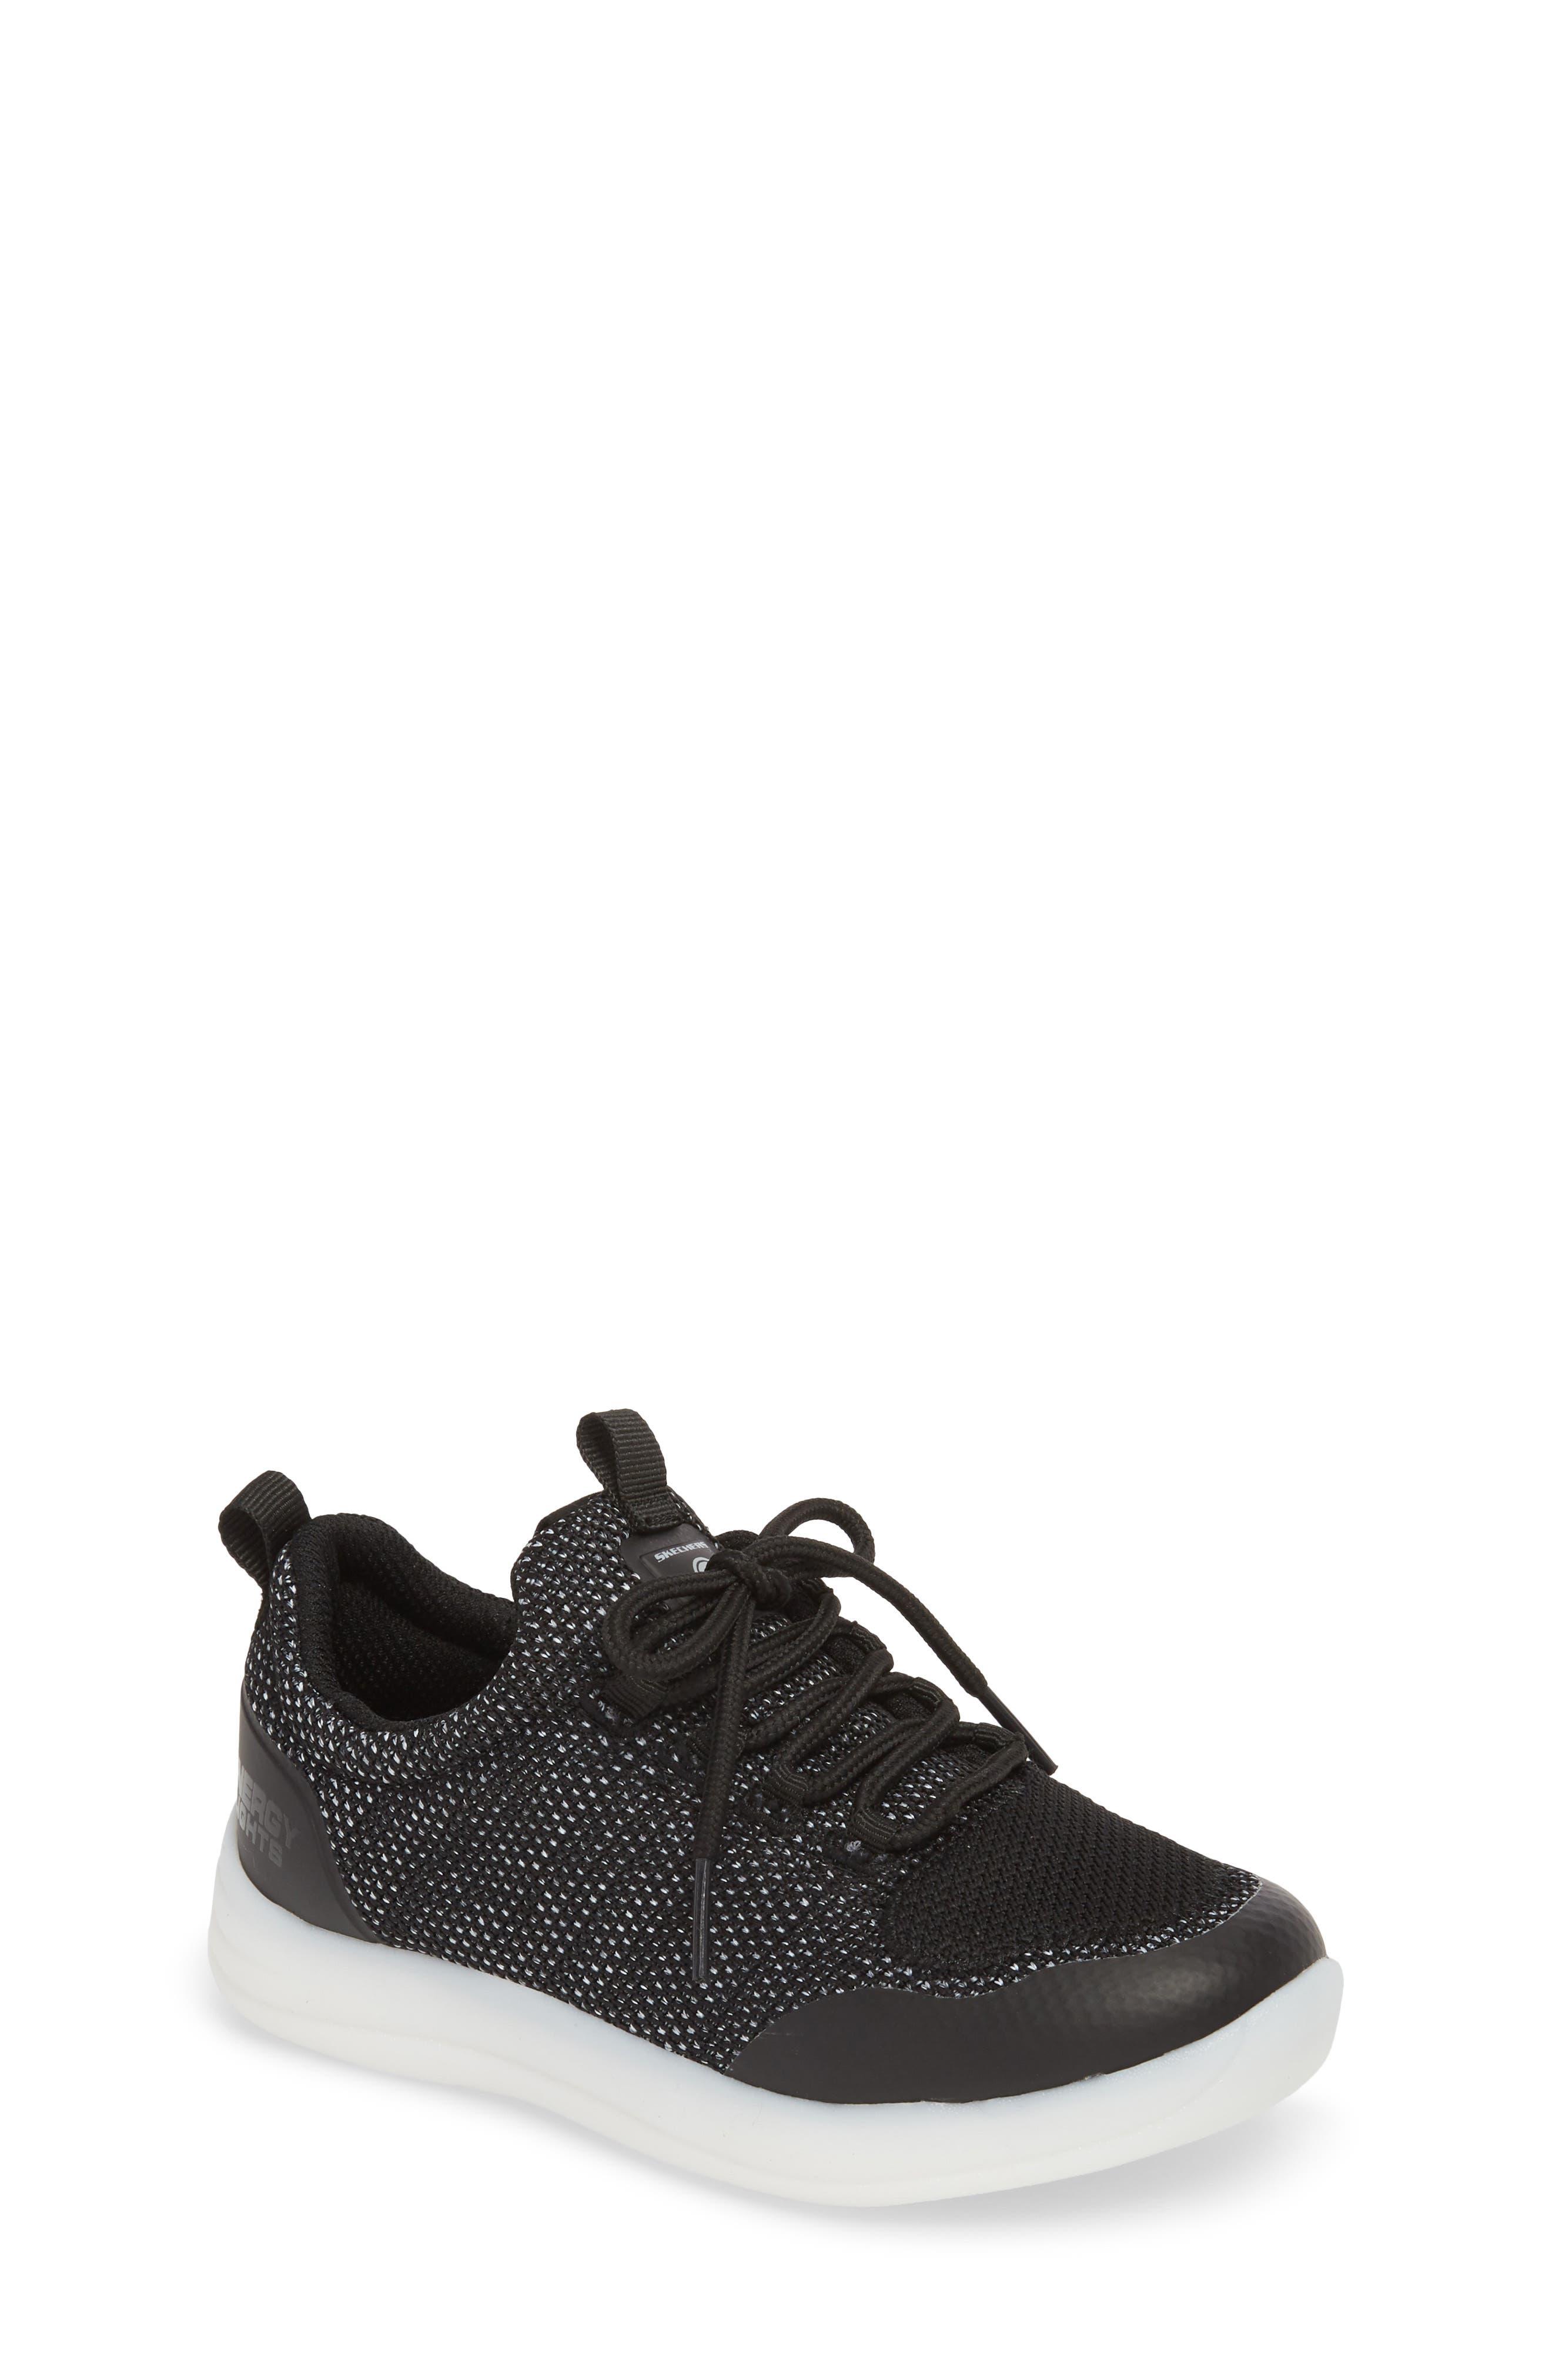 Energy Lights Street Sneaker,                         Main,                         color, Black